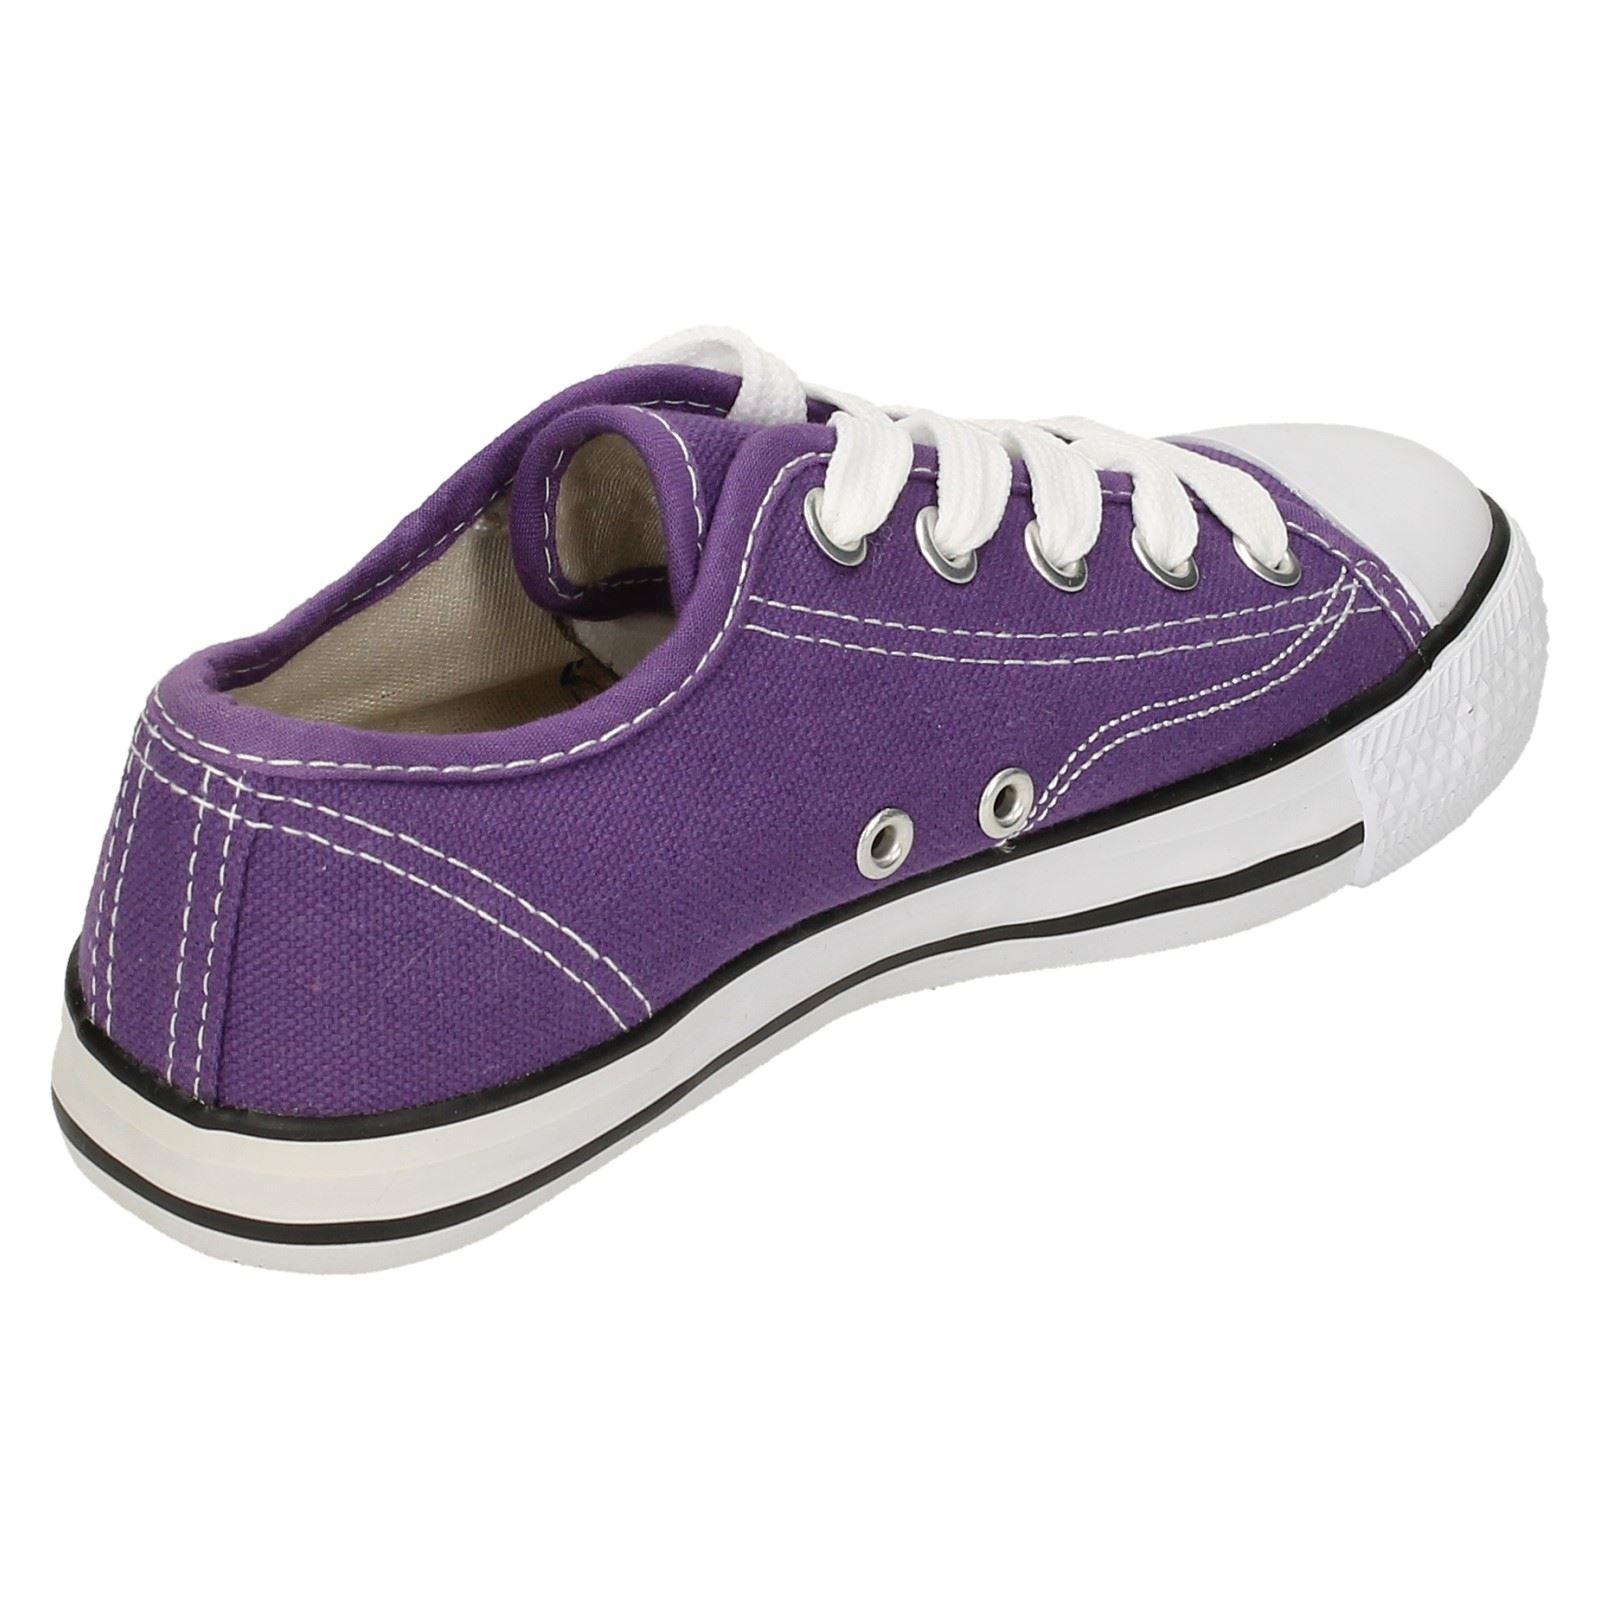 Ladies Spot On Canvas Shoes